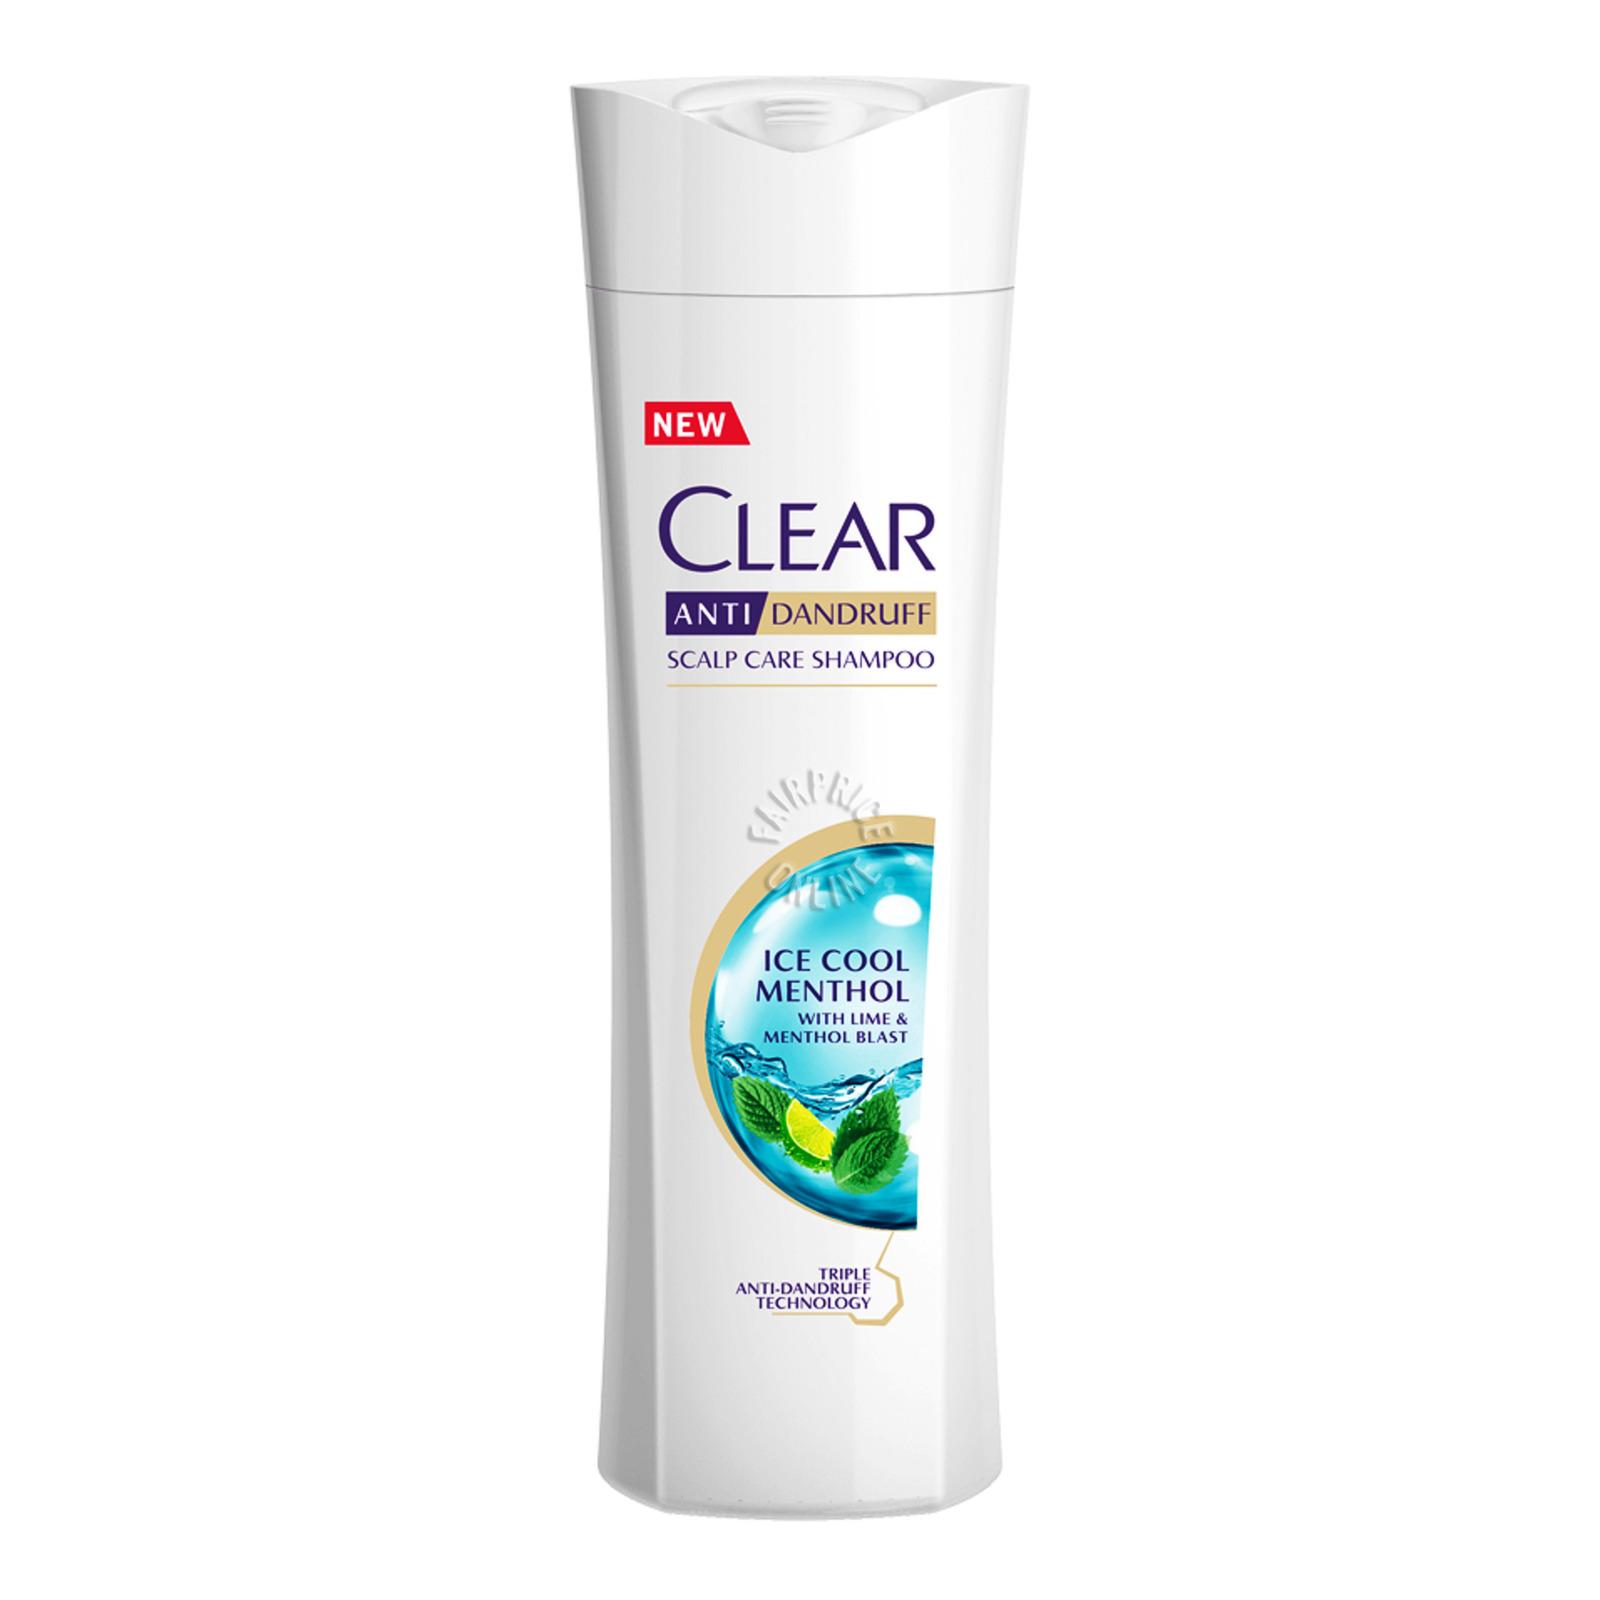 Clear Anti-Dandruff Scalp Care Shampoo - Ice Cool Menthol